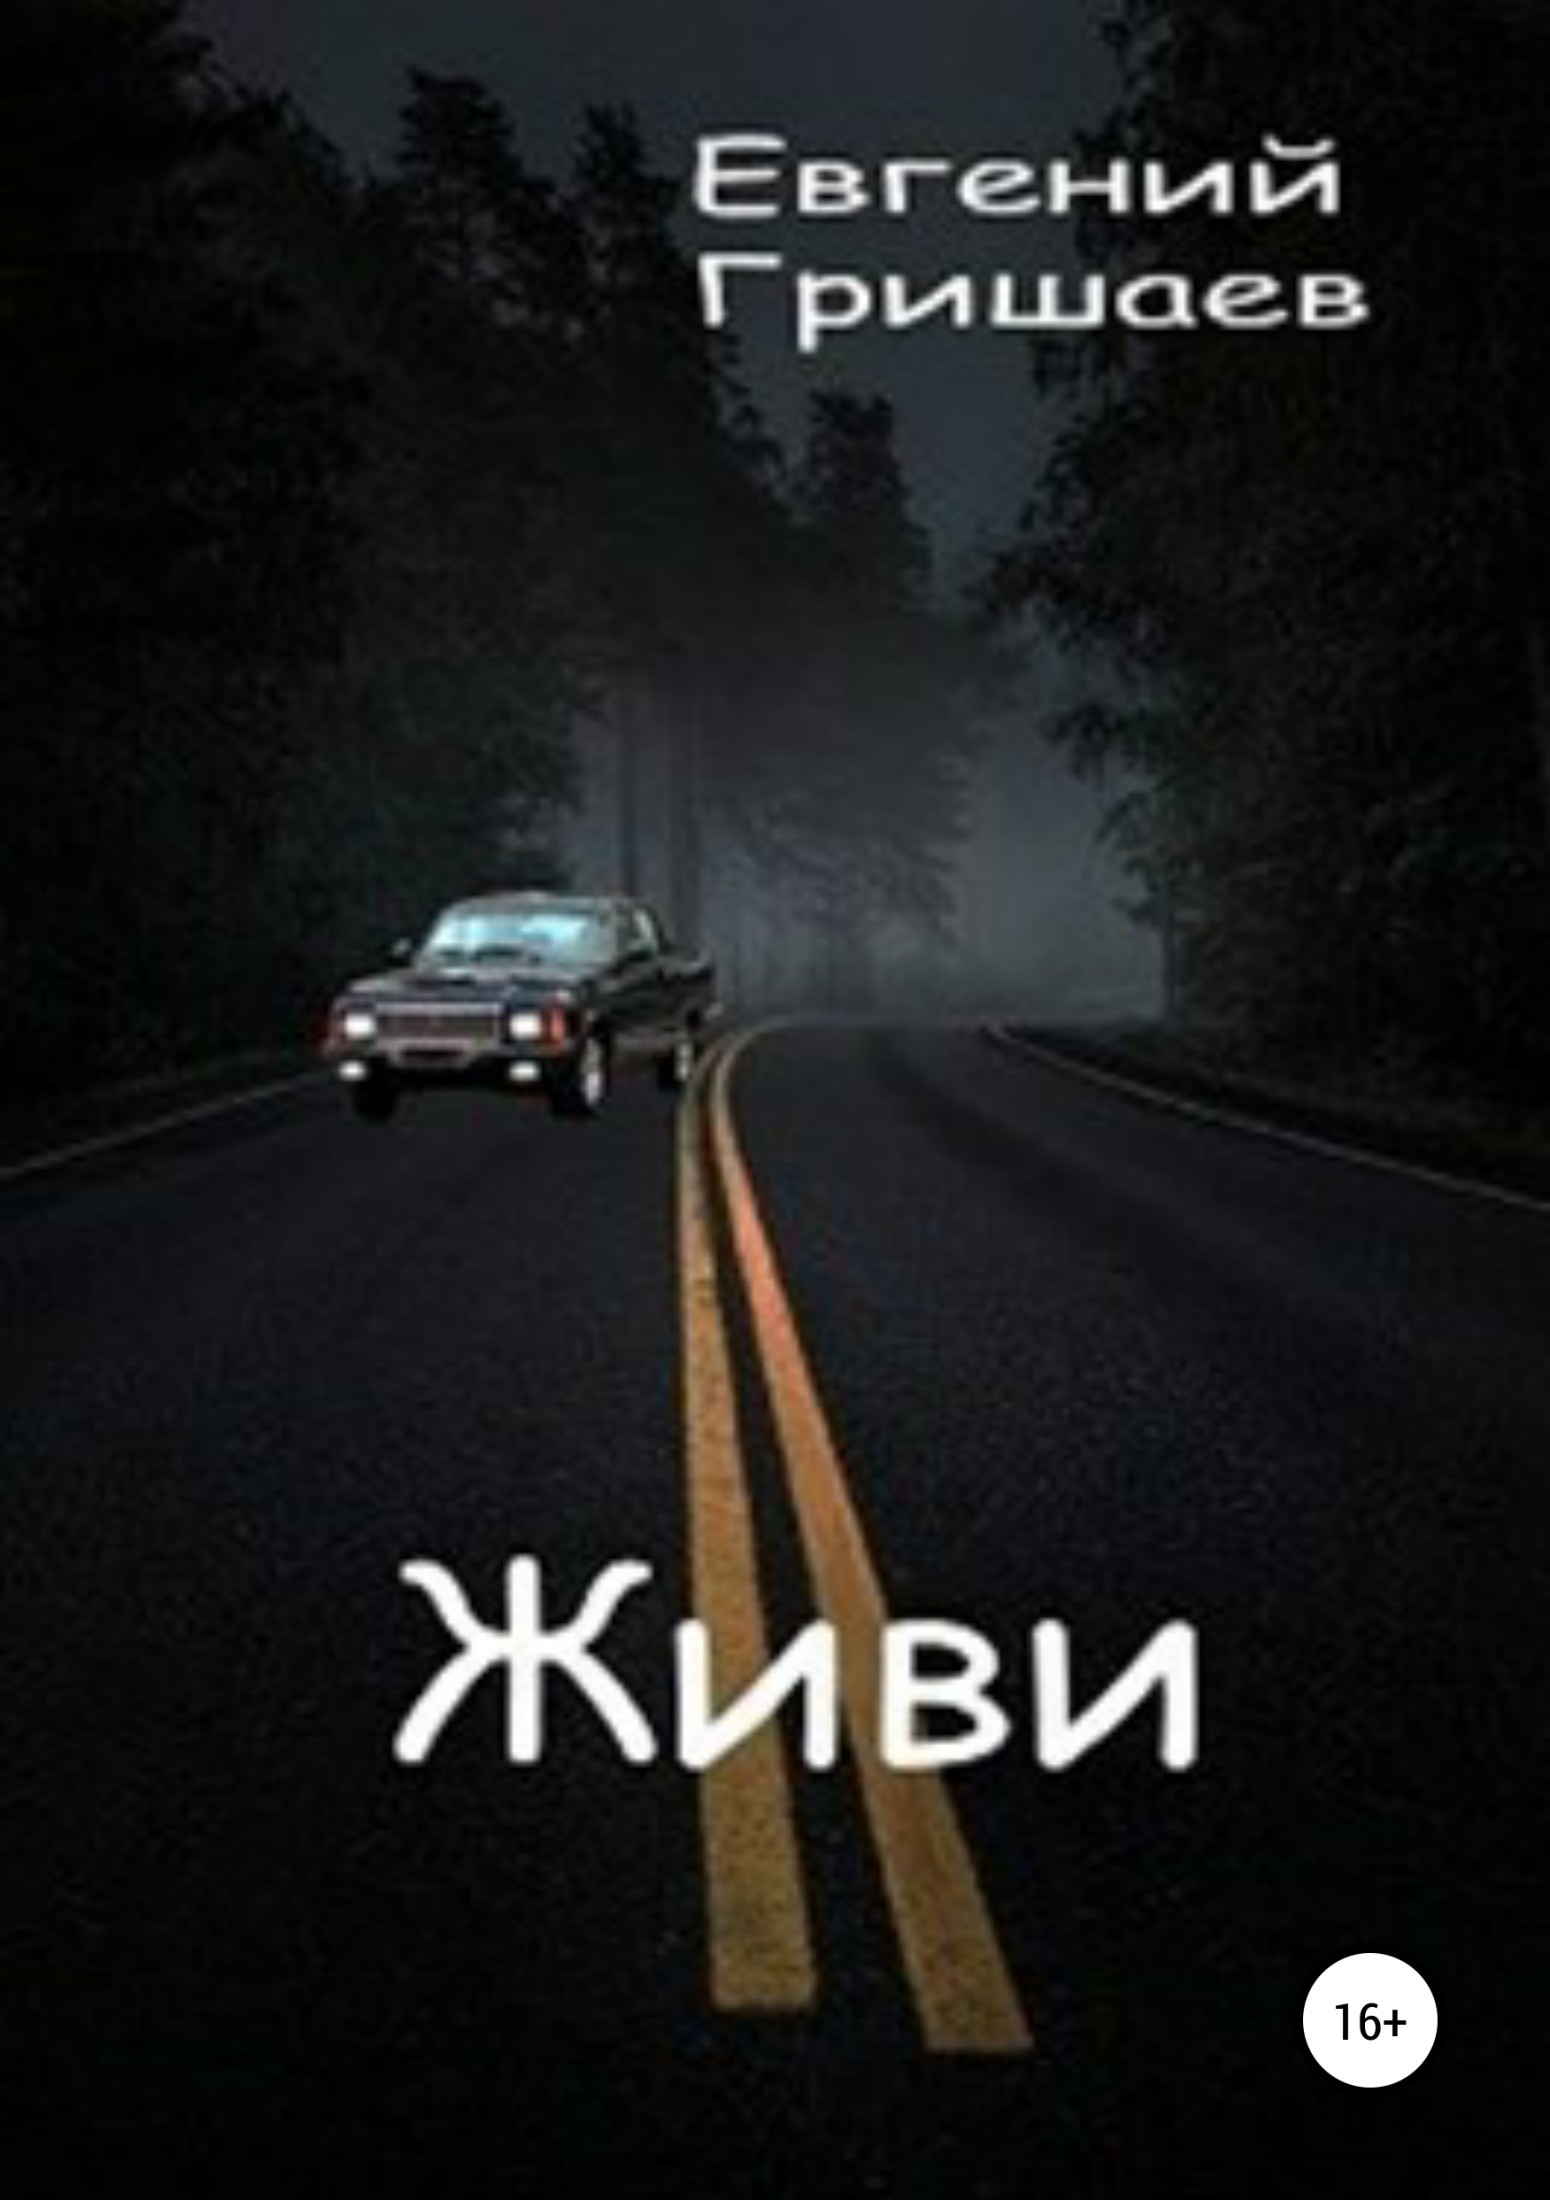 Евгений Алексеевич Гришаев Живи евгений алексеевич гришаев живи